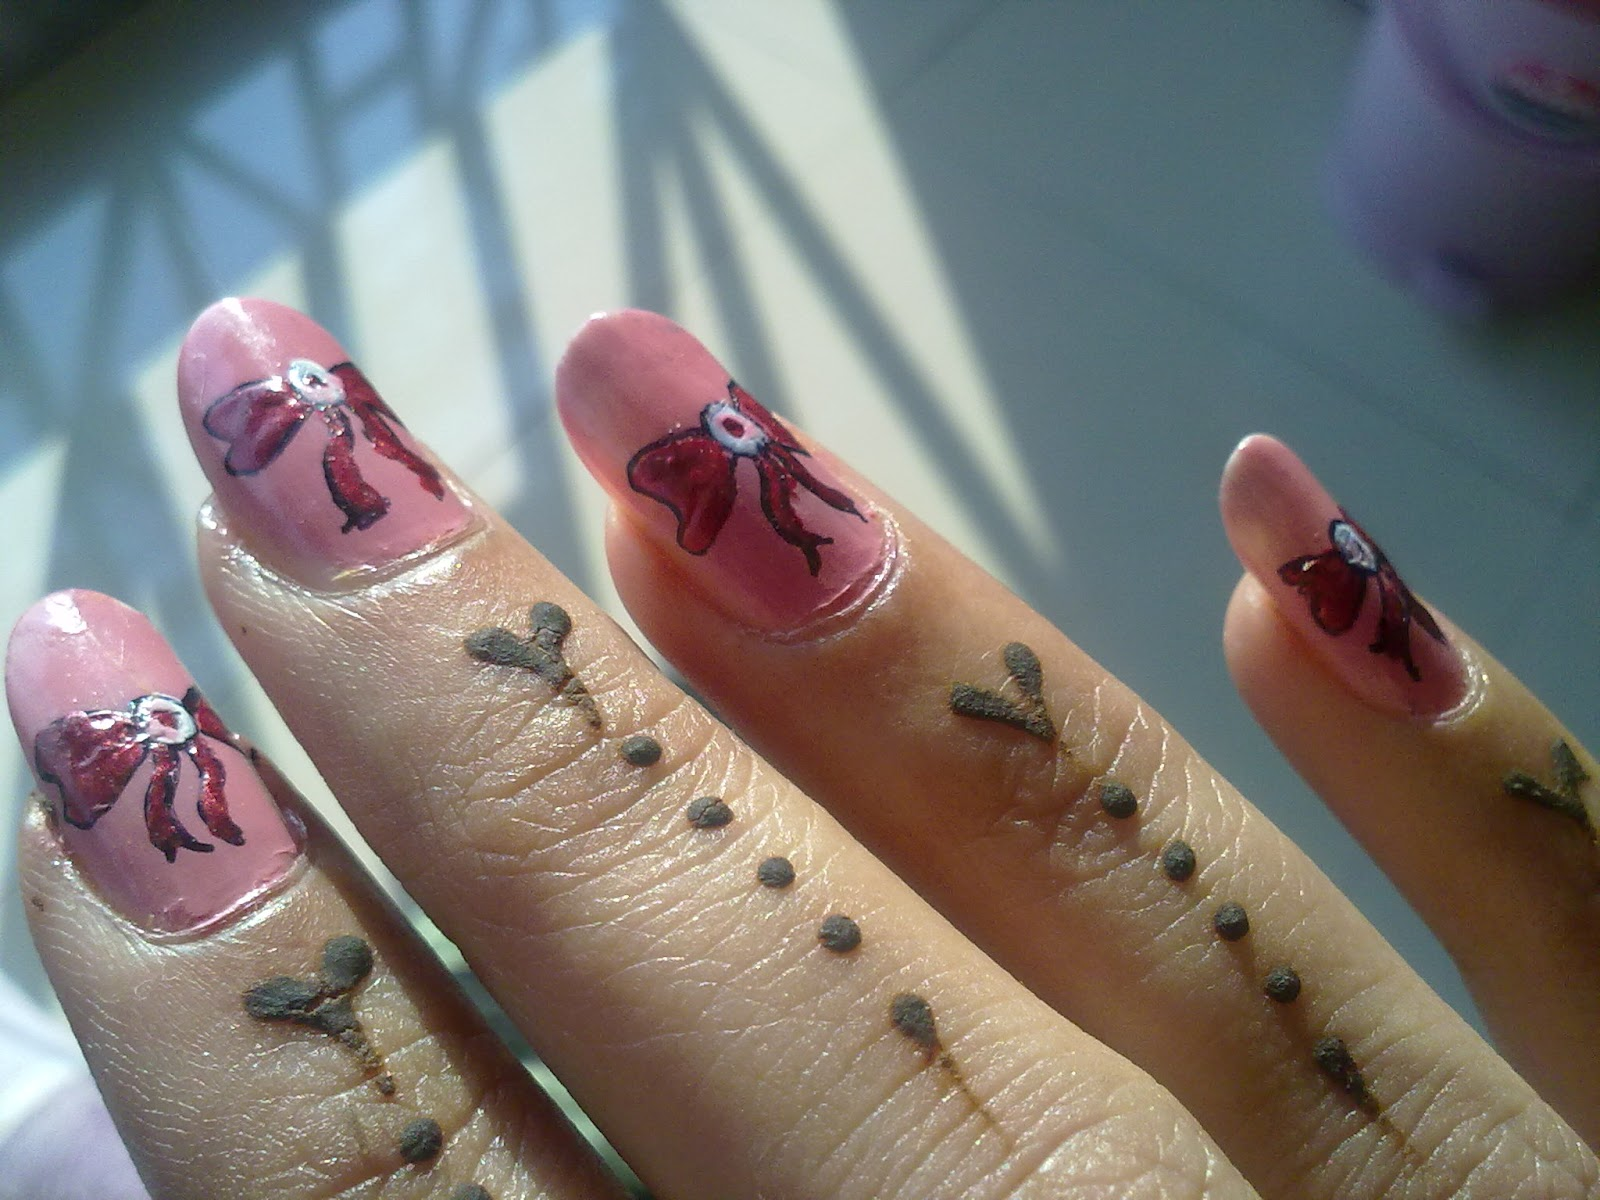 Nail art: 6 different nail art designs